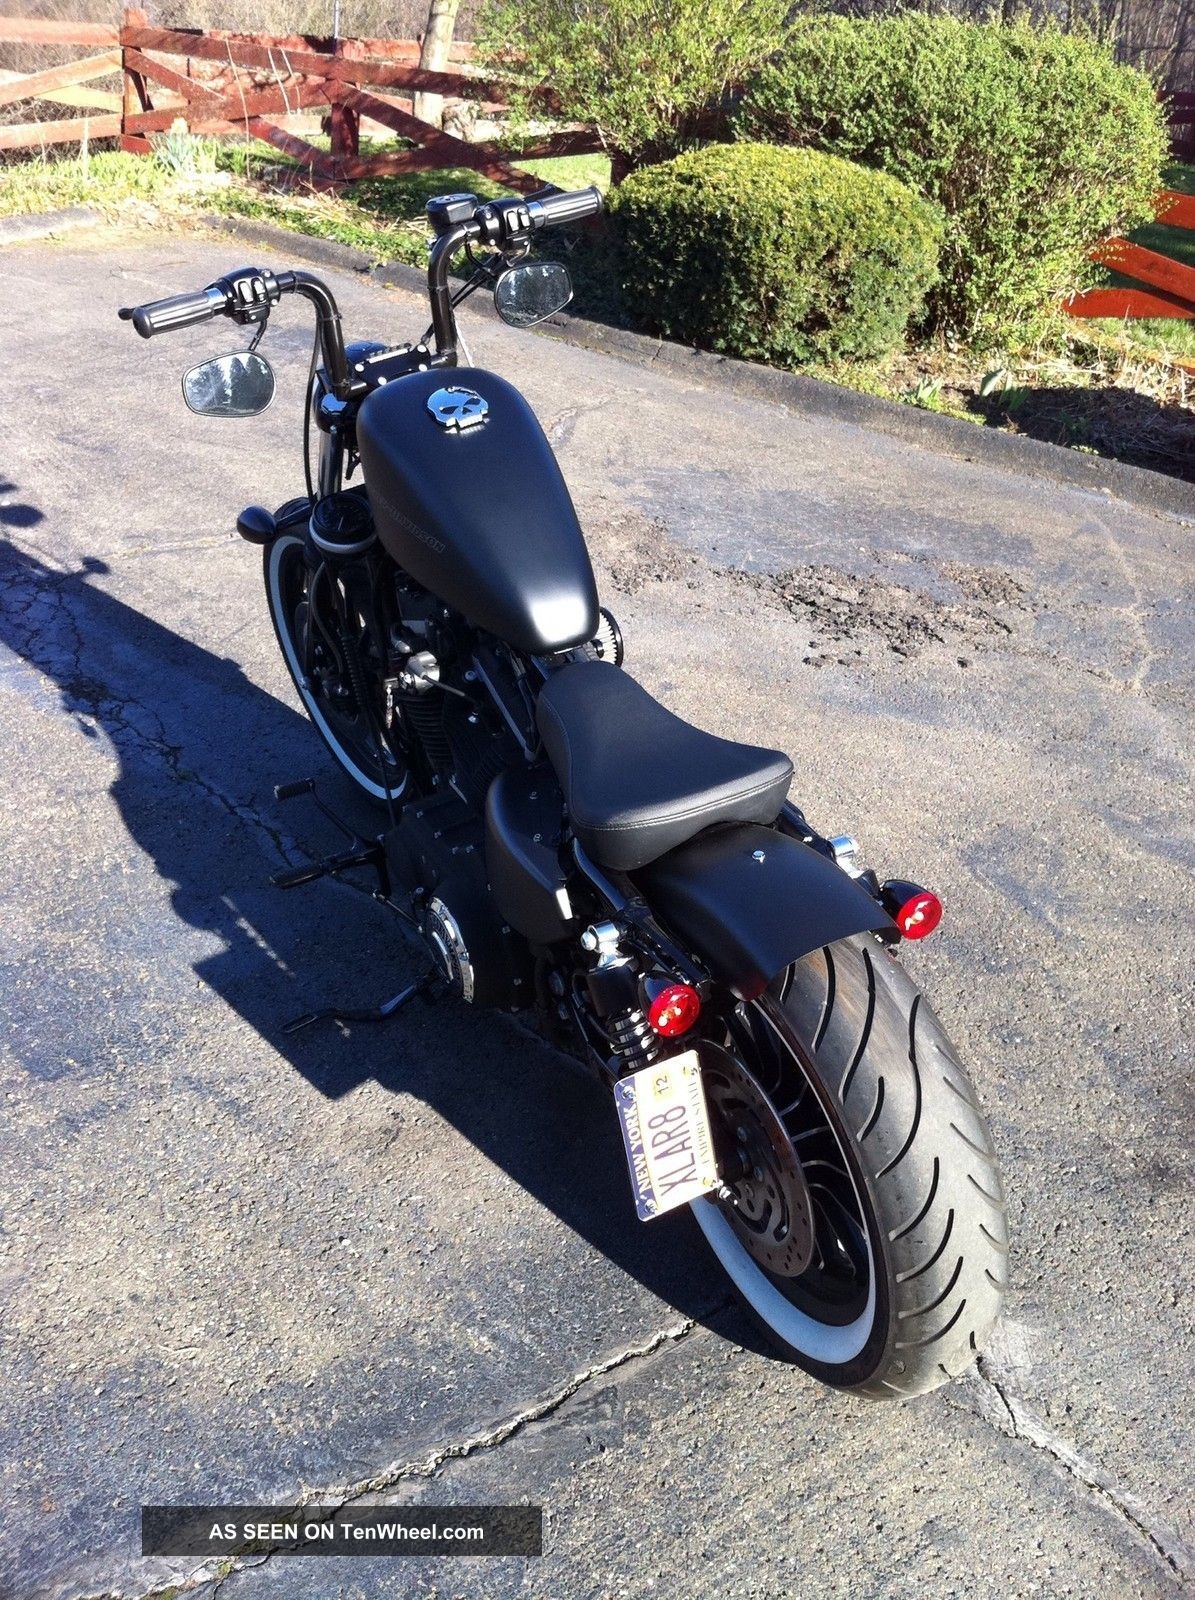 2009 Iron 883 Harley Davidson Sportster